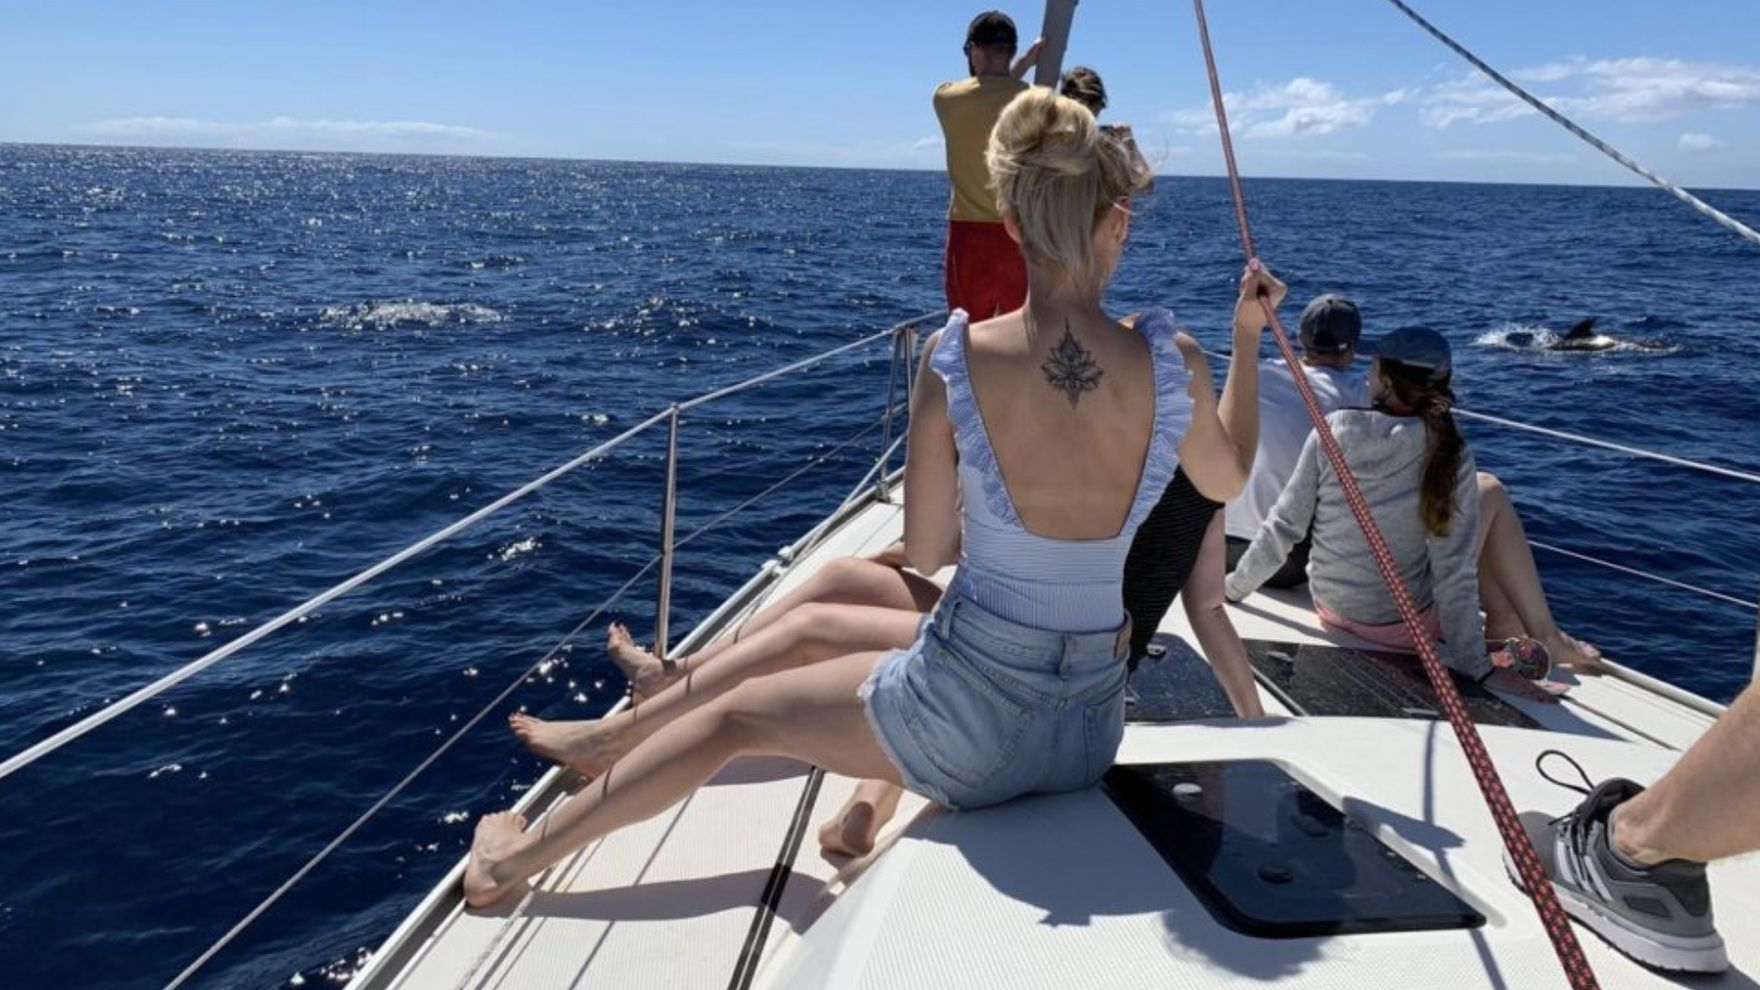 New  Year yachting in Tenerife 2020